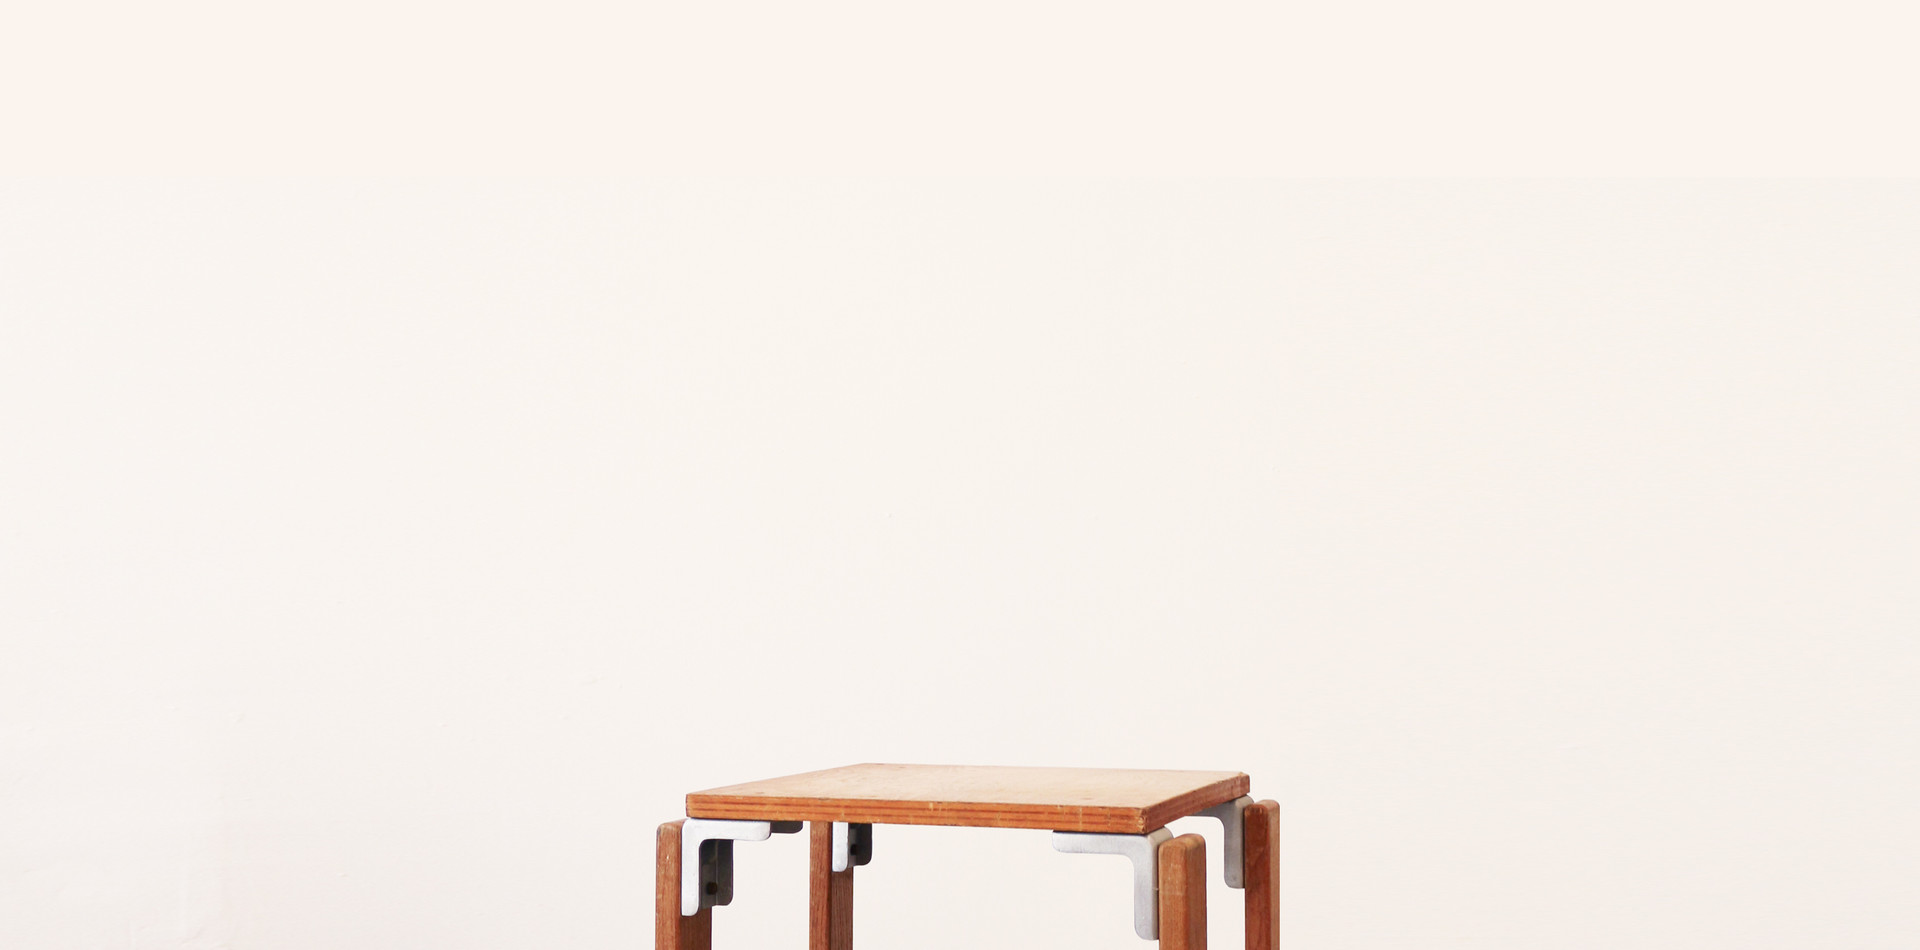 Candilis_mobilier_furiture_stool.jpg